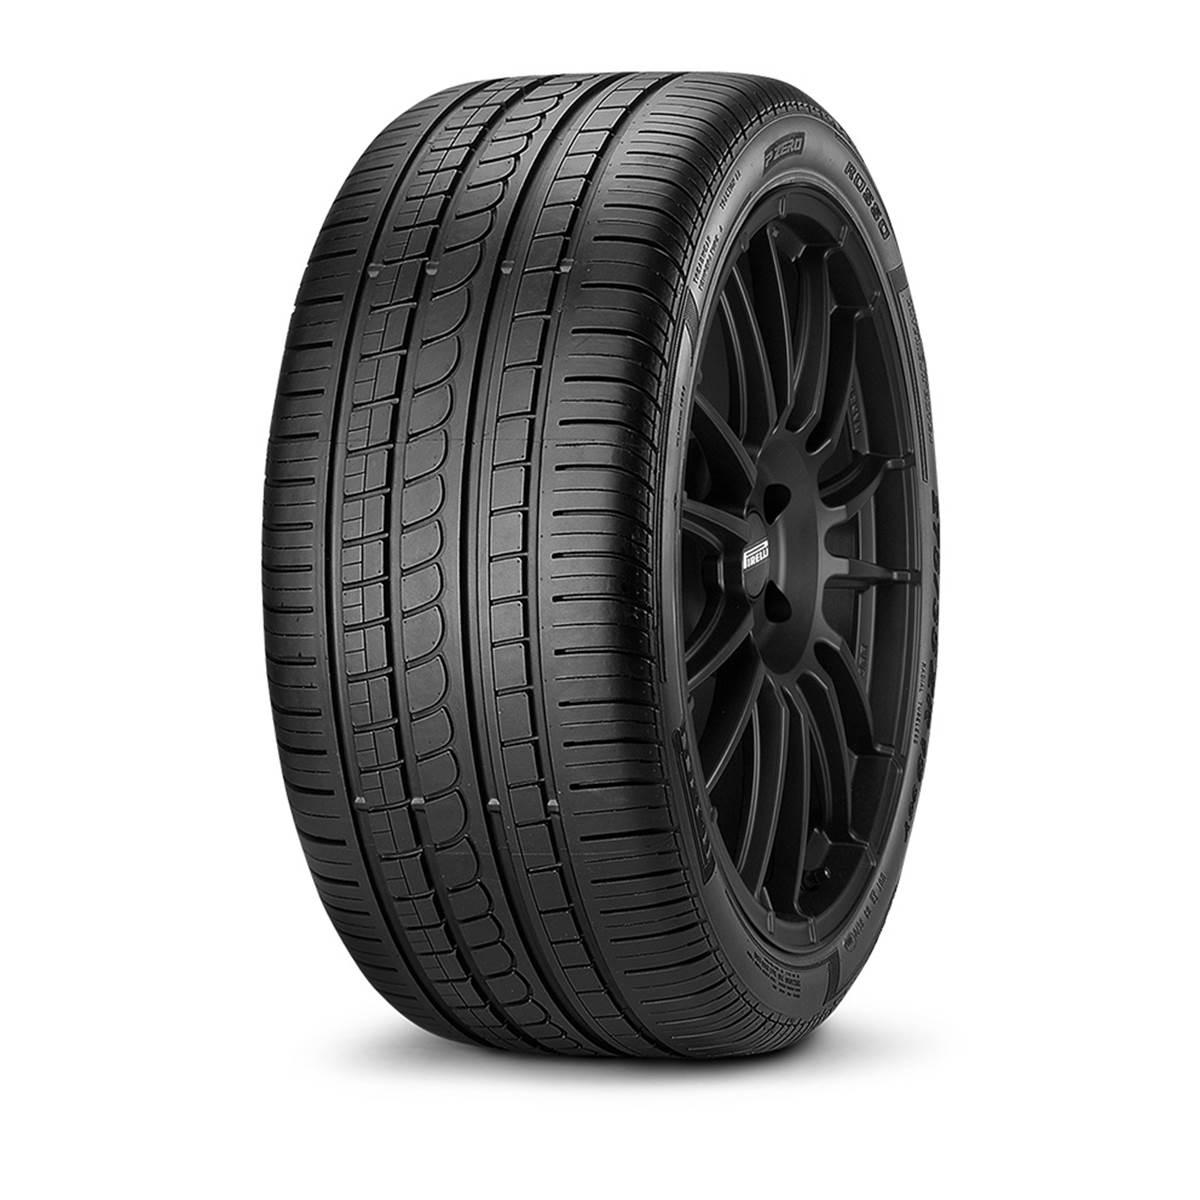 Pneu Pirelli 205/50R17 89Y Pzero Rosso Asimmetrico